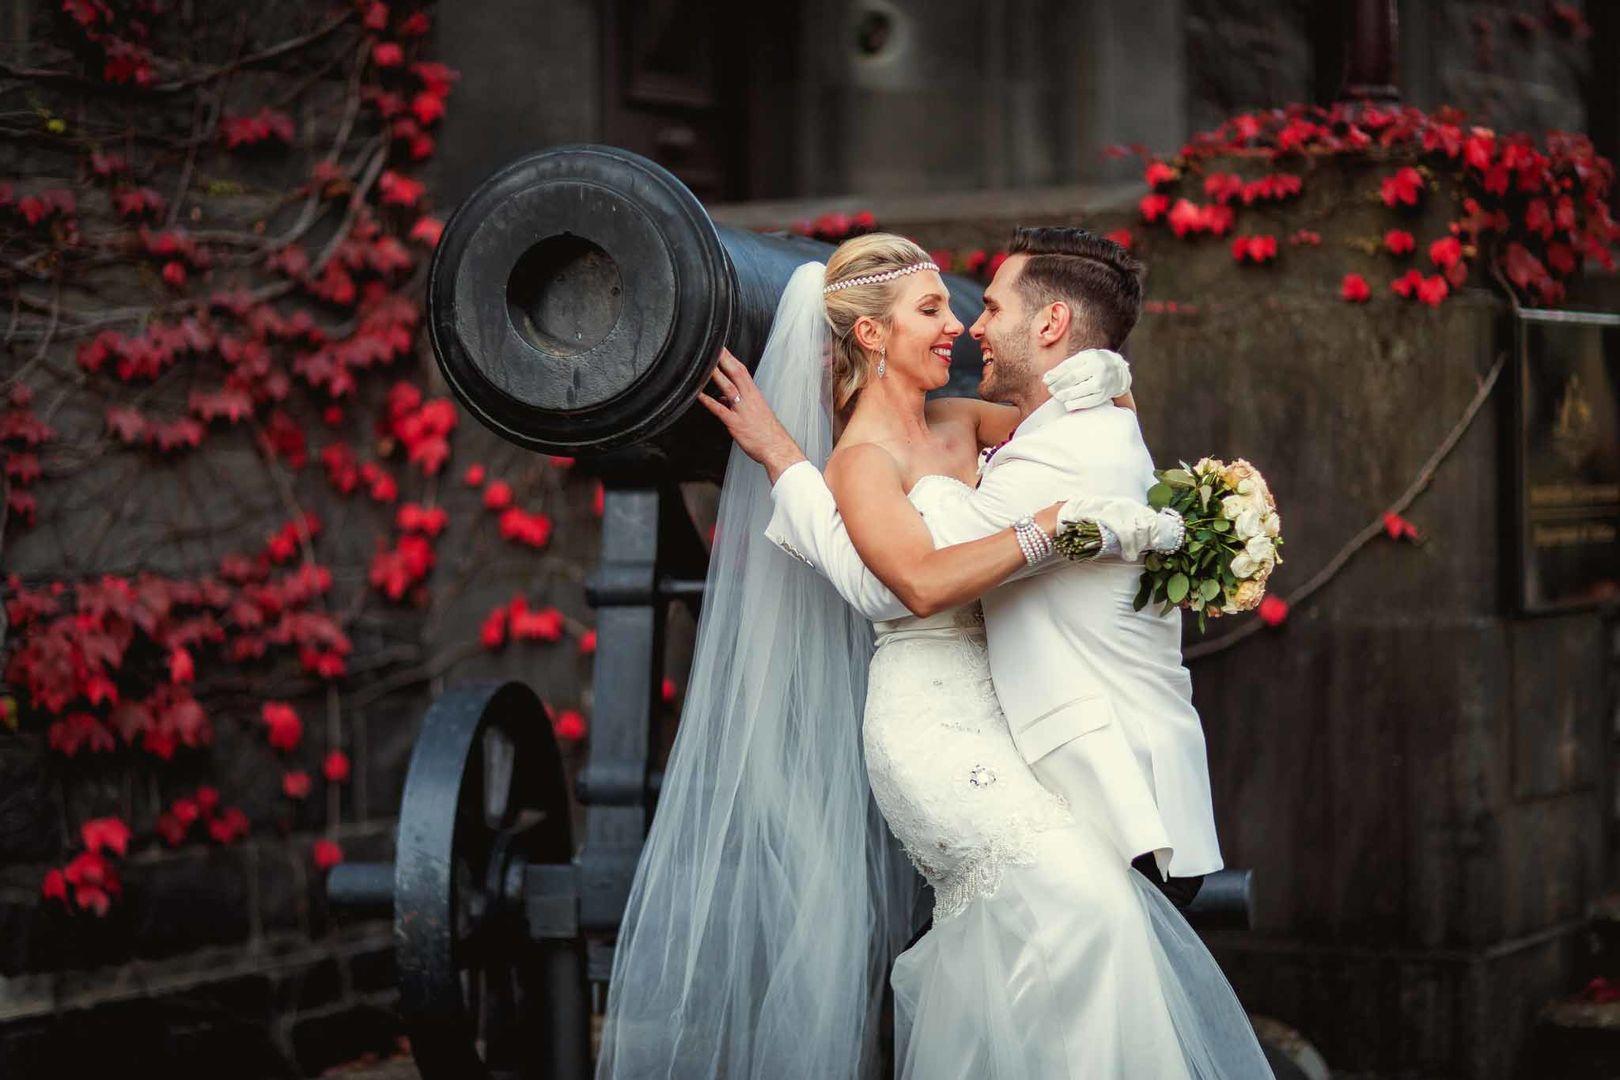 Few Advice How to Choose a Wedding Photographer Singapore